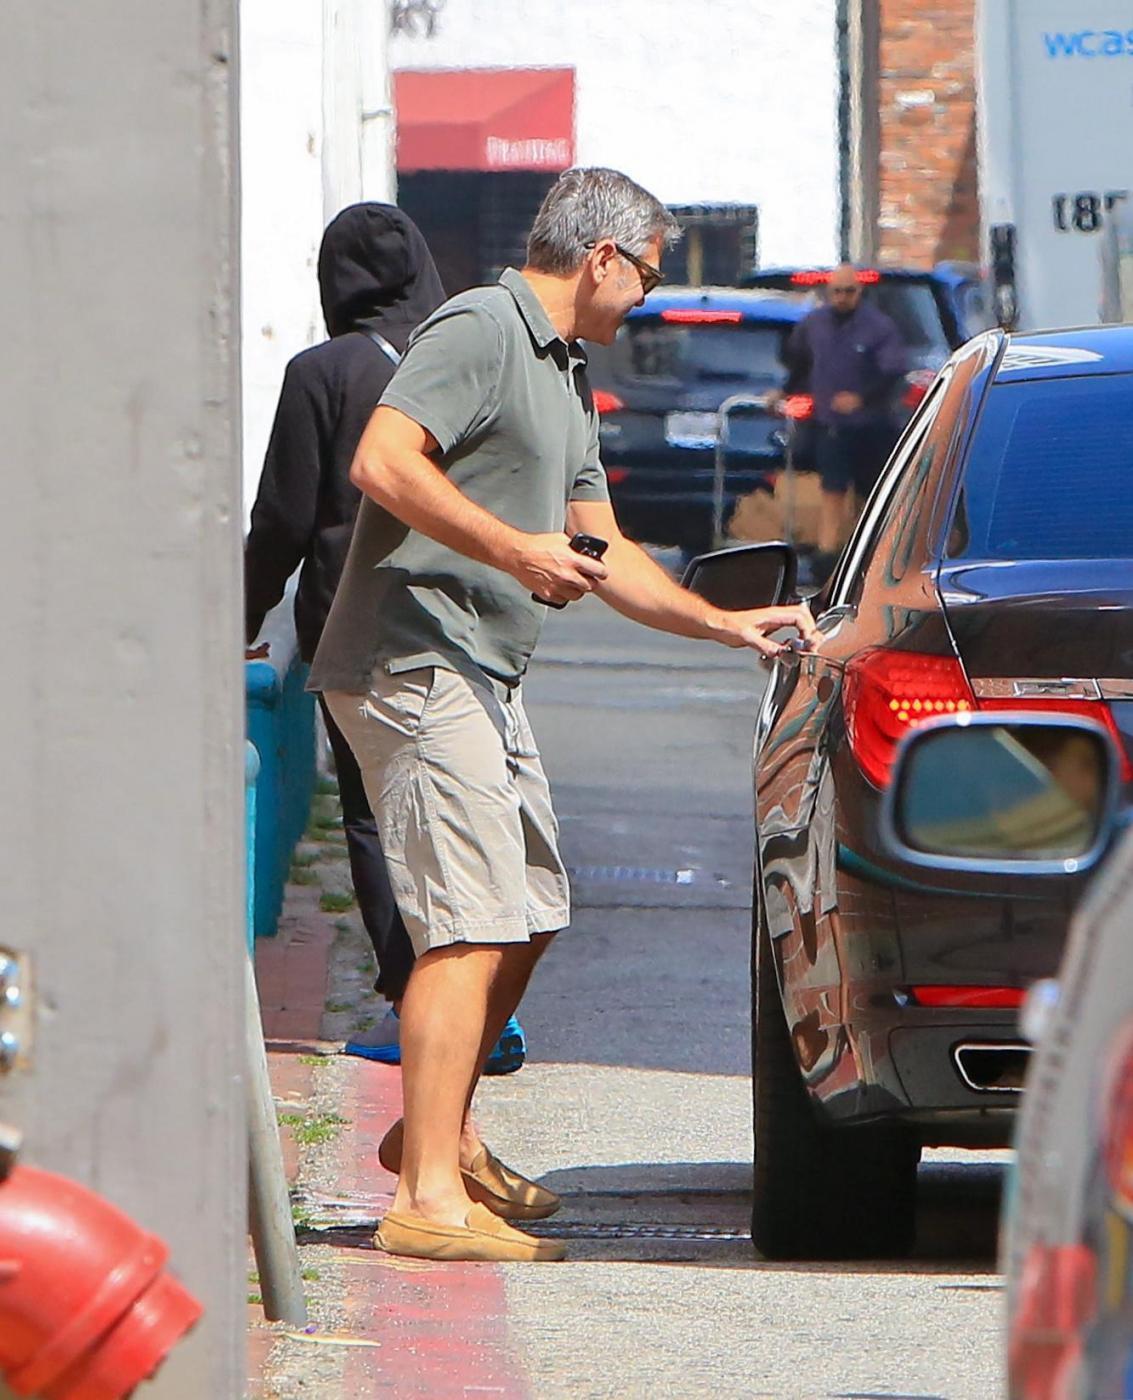 George Clooney, pantaloni corti e mocassini in giro per Beverly Hills FOTO 15